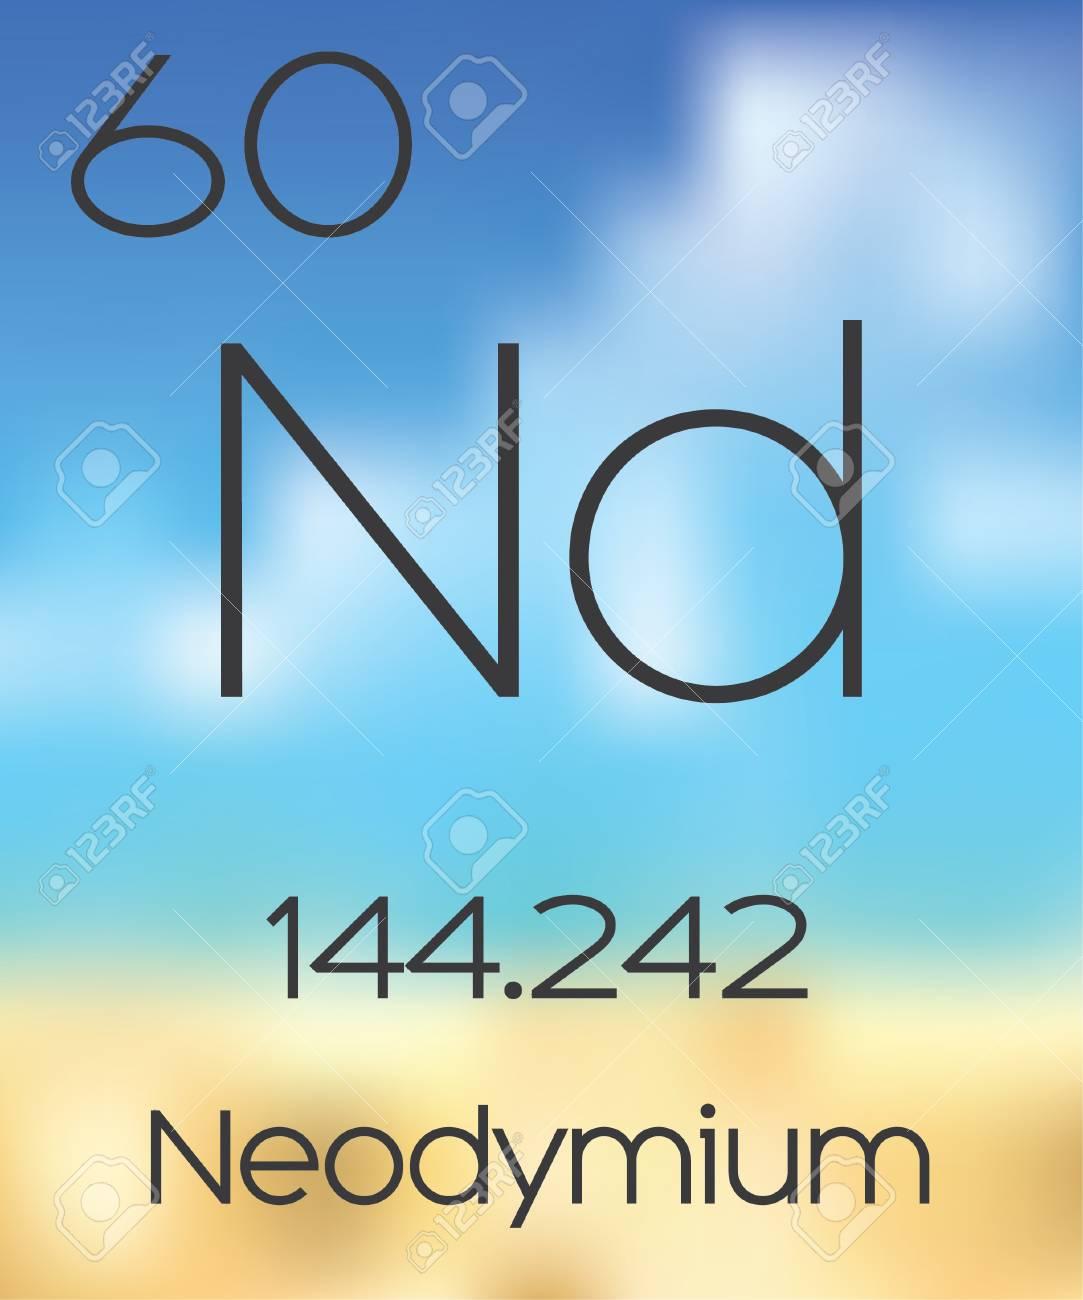 The periodic table of the elements neodymium stock photo picture the periodic table of the elements neodymium stock photo 47534300 gamestrikefo Choice Image